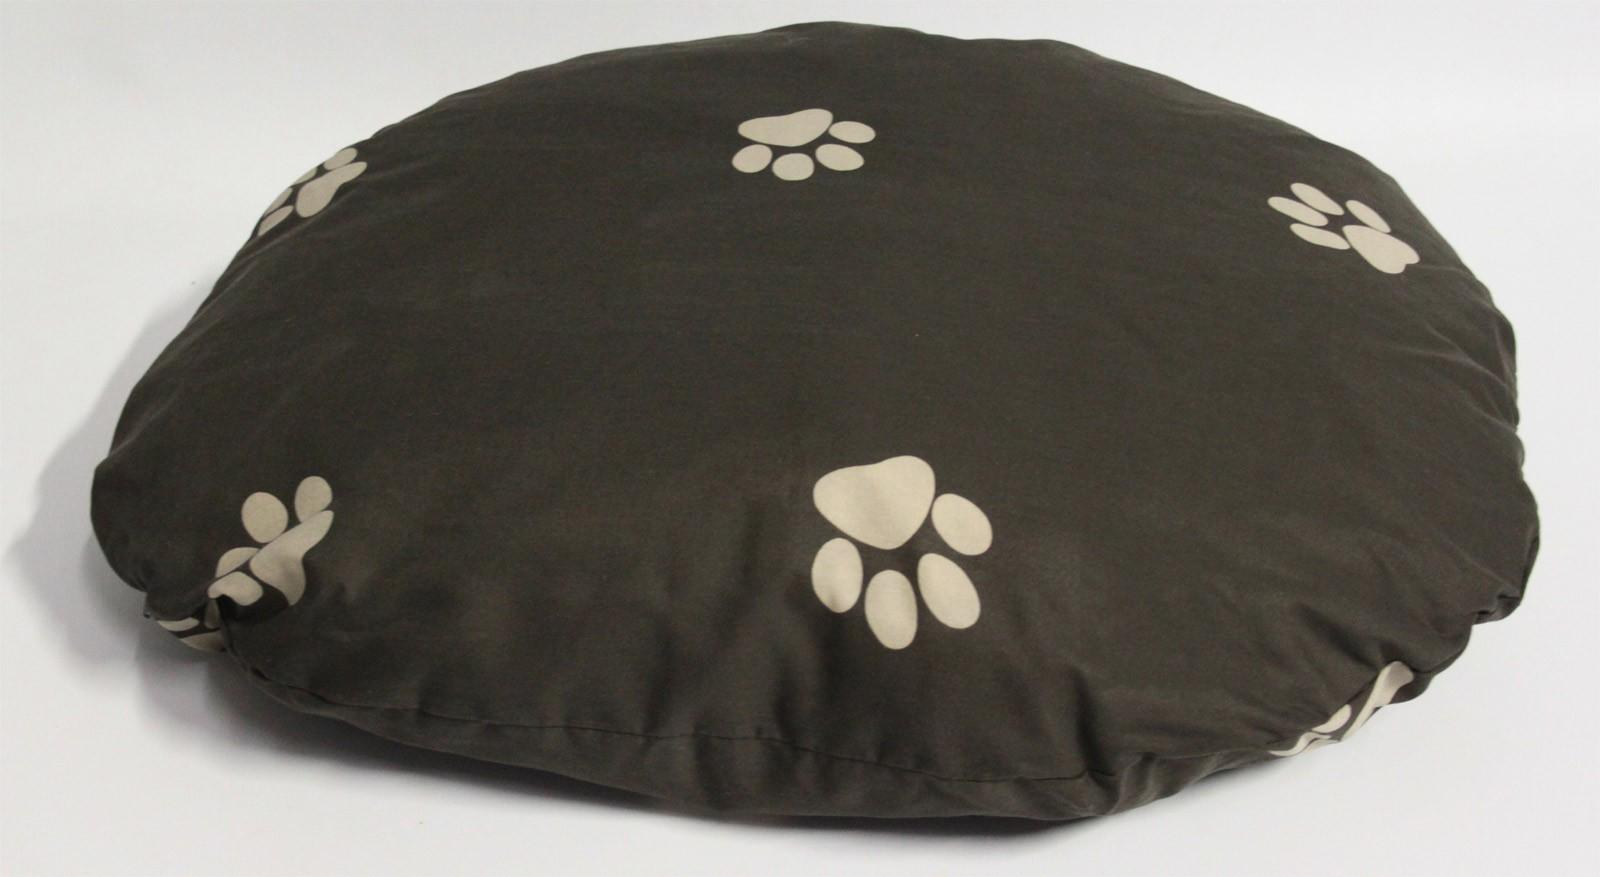 Hundebett / Hundekissen Beo 75x60x10cm oval M320 braun / beige Bild 1